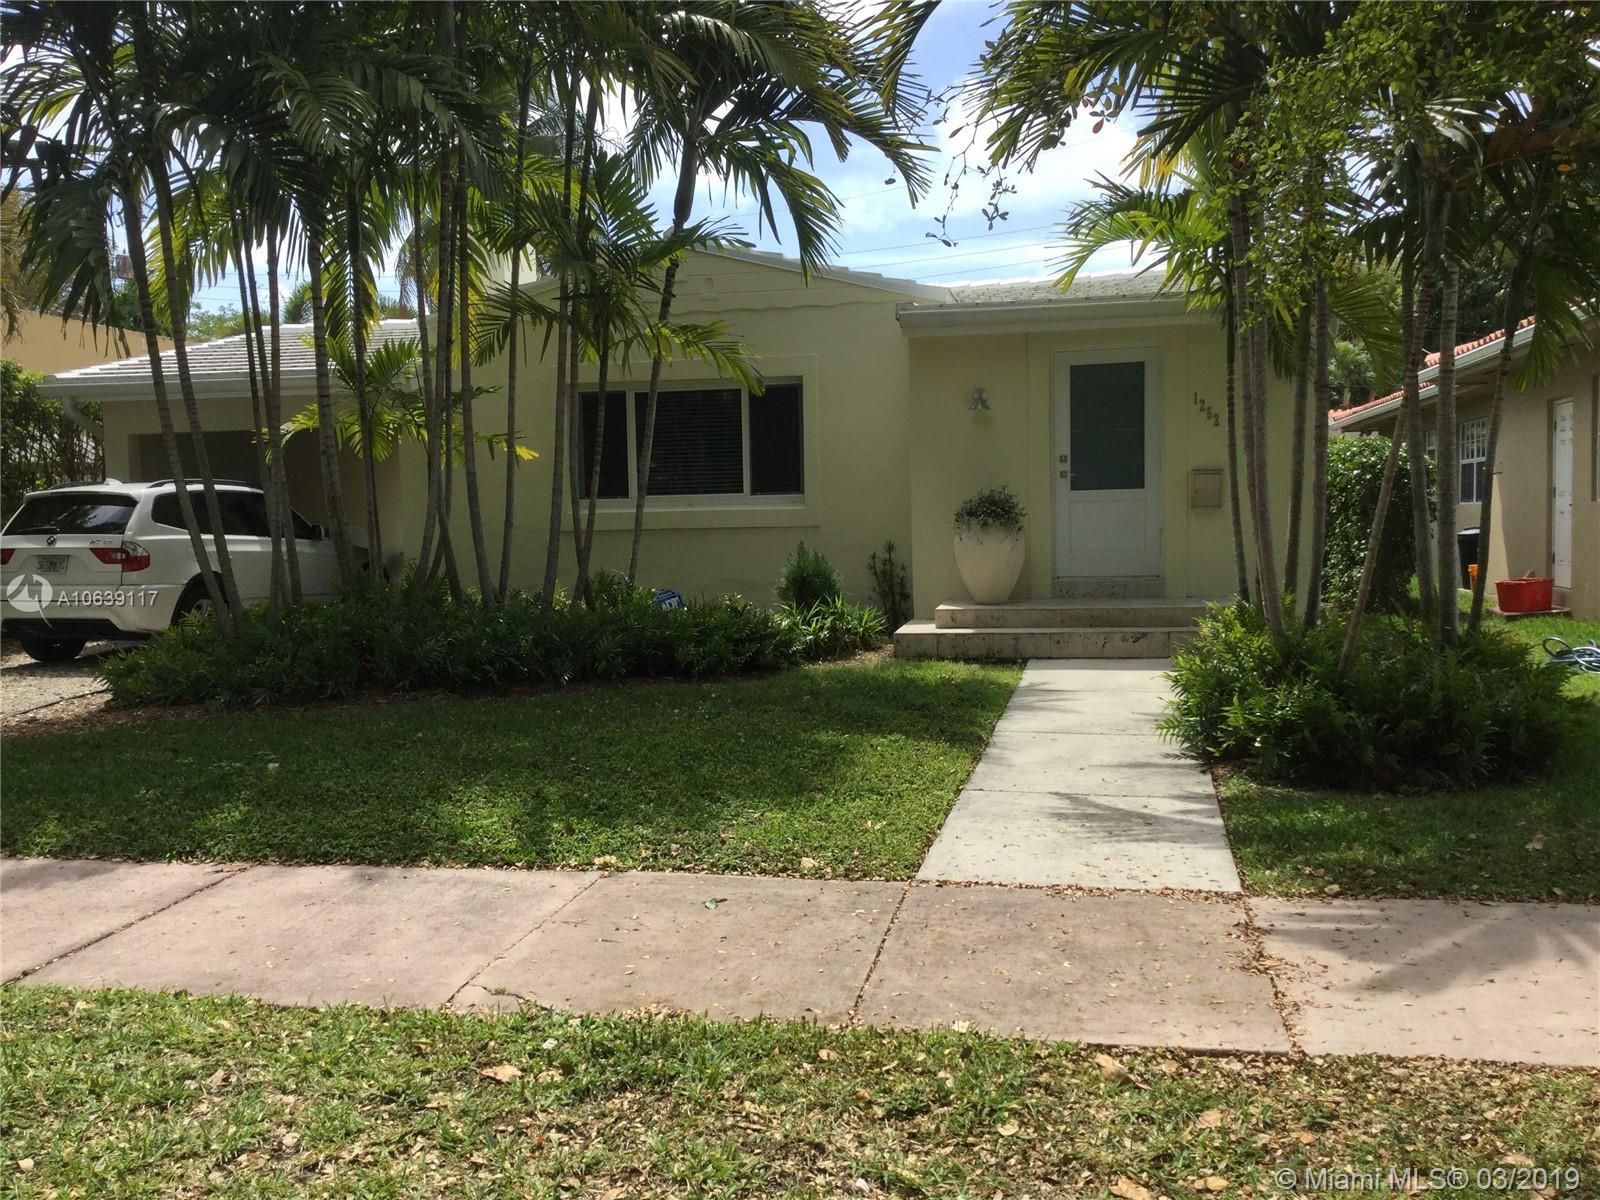 1252 Mariana Ave, Coral Gables FL 33134